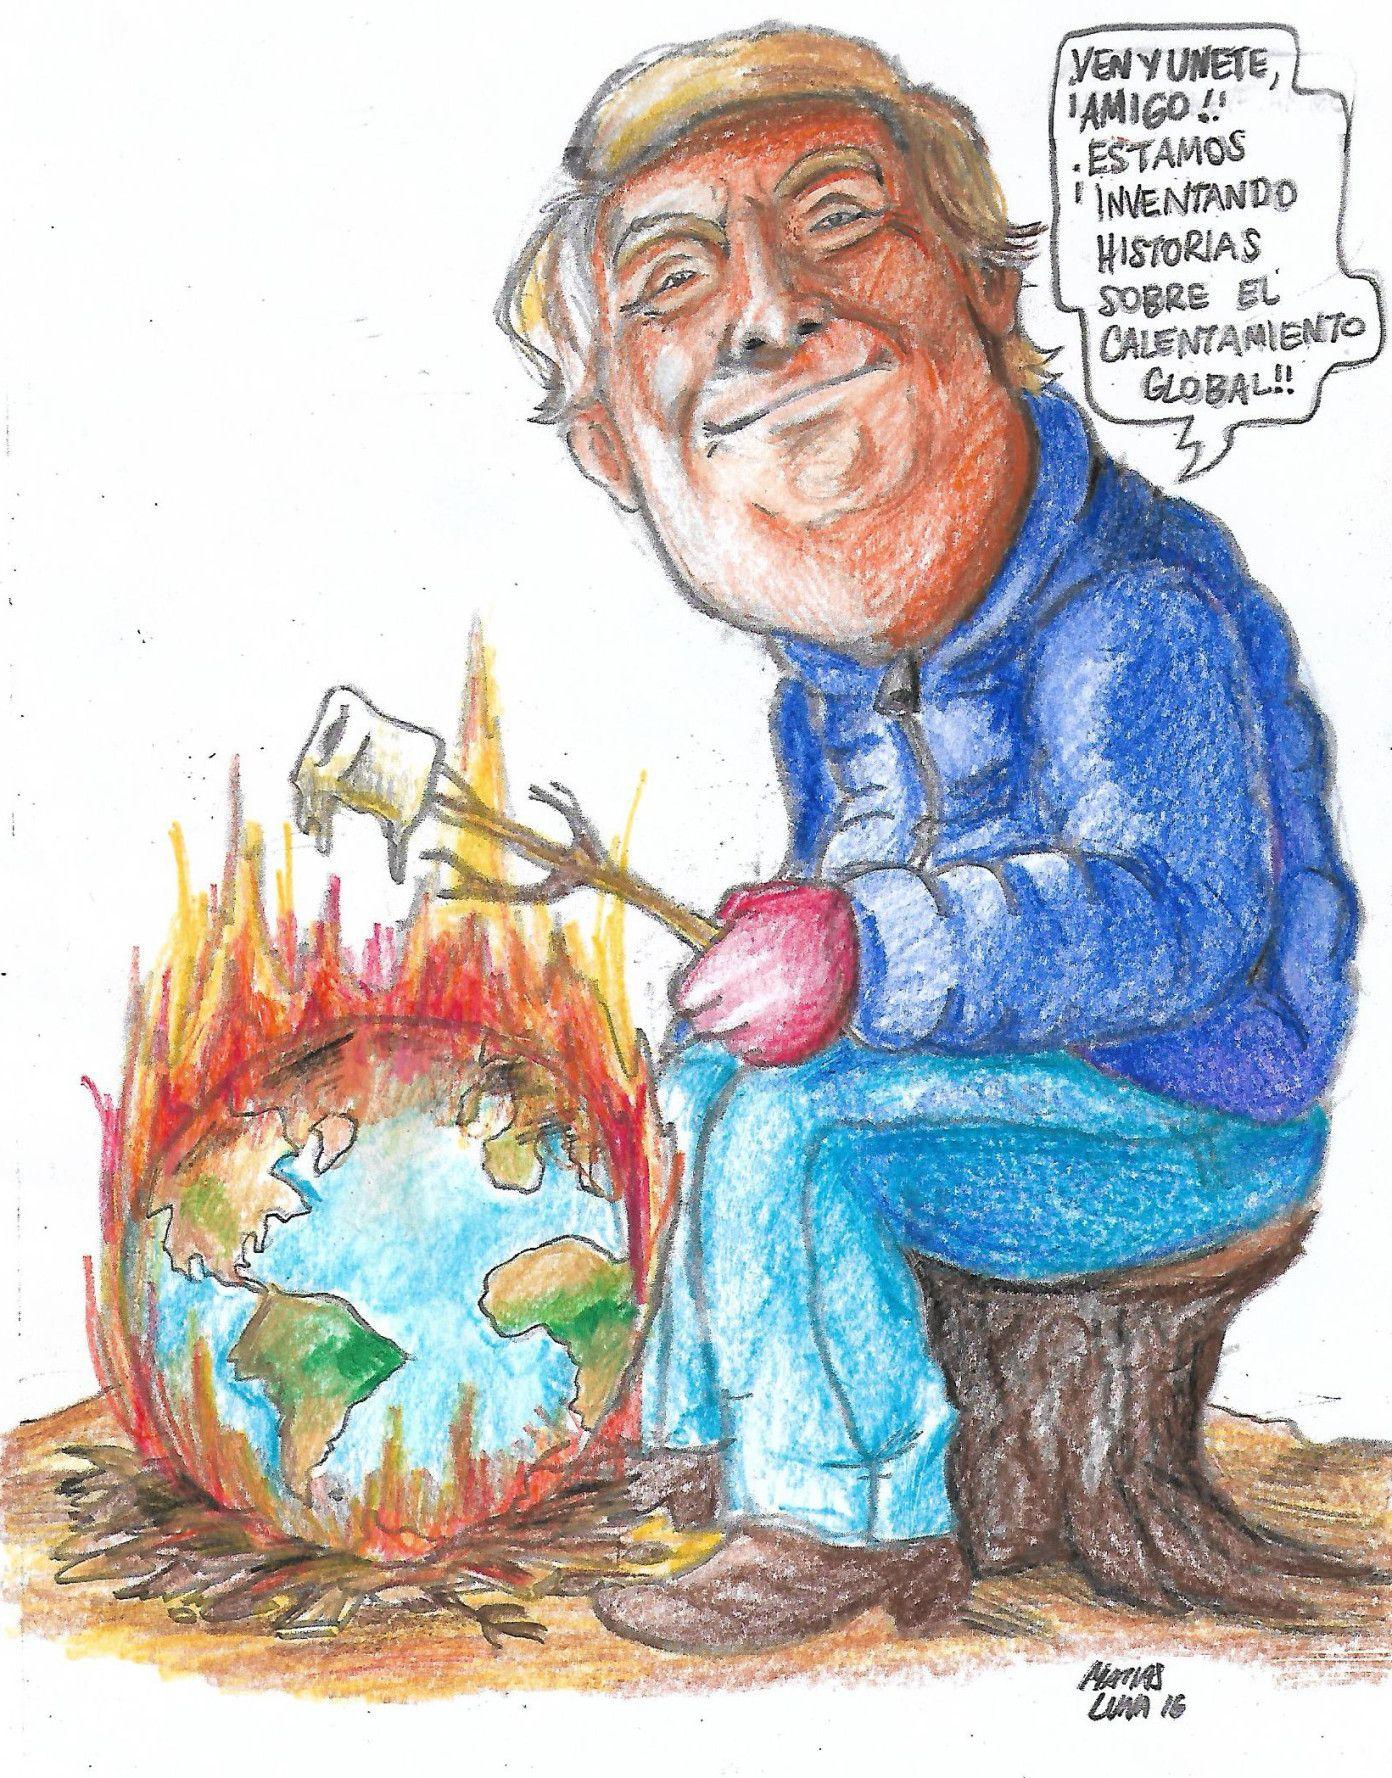 Global Warning Calentamiento Global Calentamiento Global Dibujos Dibujos